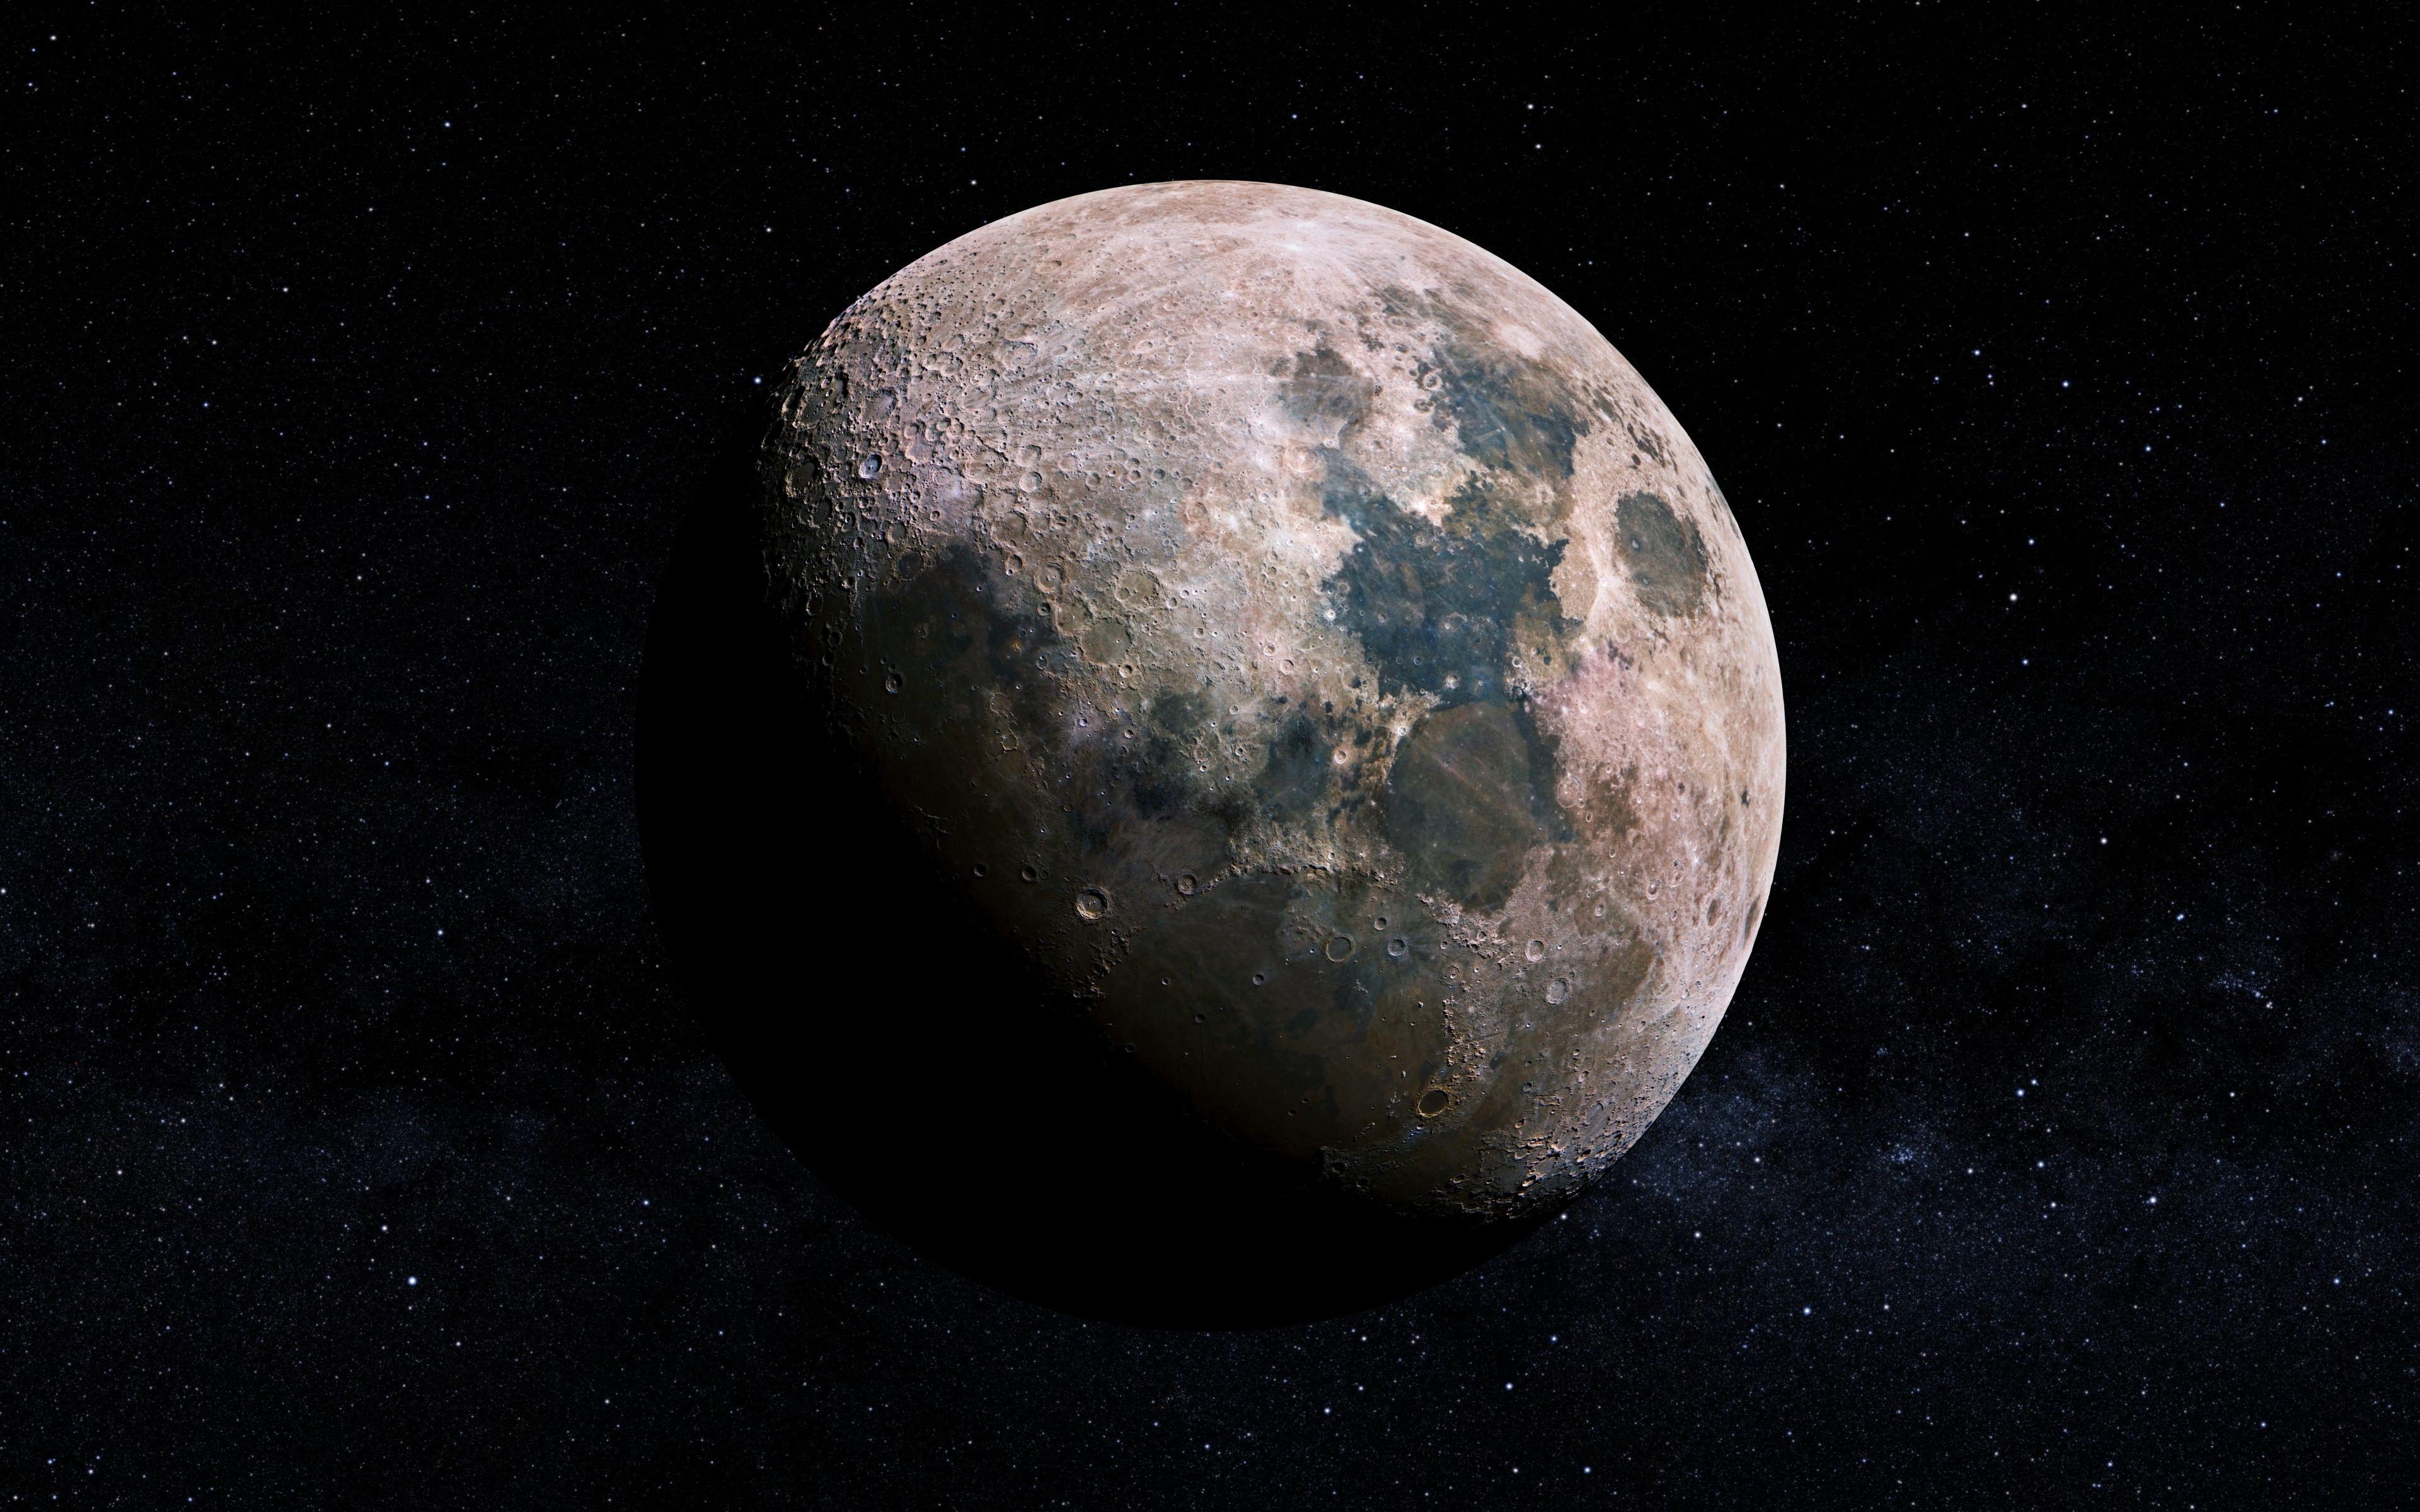 4K Moon Wallpapers   Top 4K Moon Backgrounds   WallpaperAccess 3840x2400